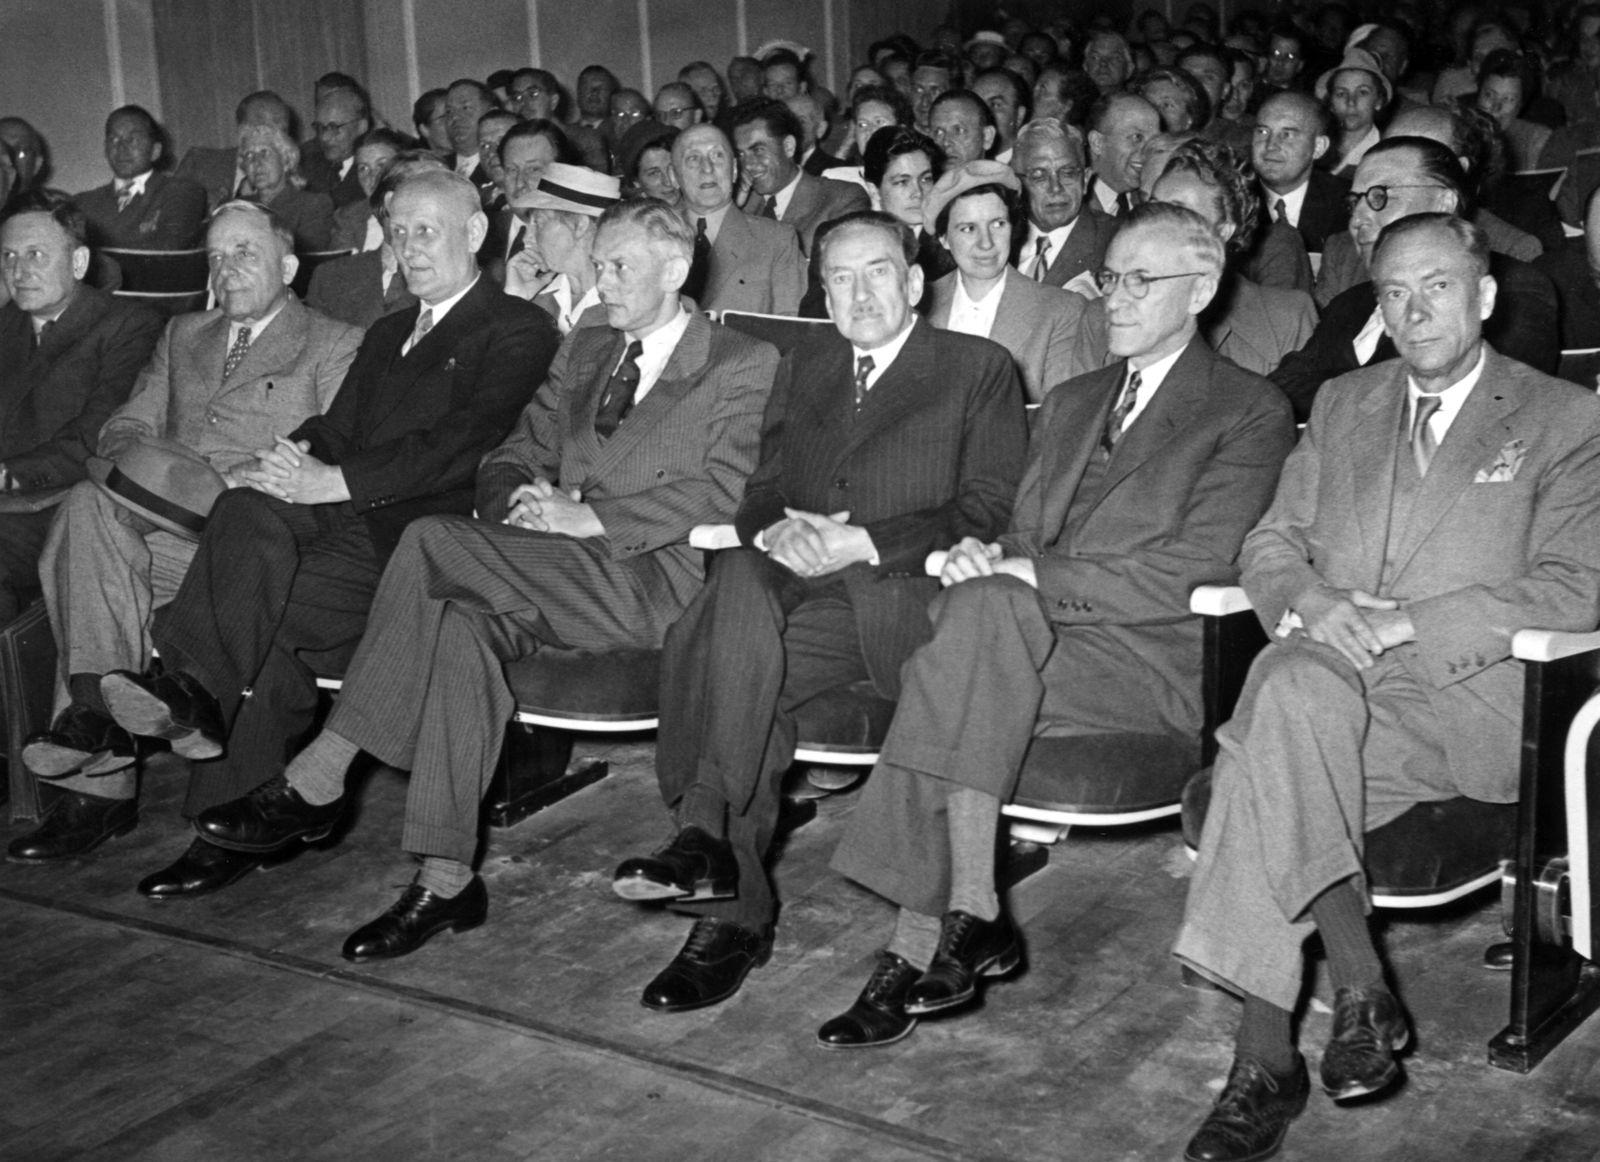 EINMALIGE VERWENDUNG Nobelpreis/ Nobelpreisträger/ Tagung